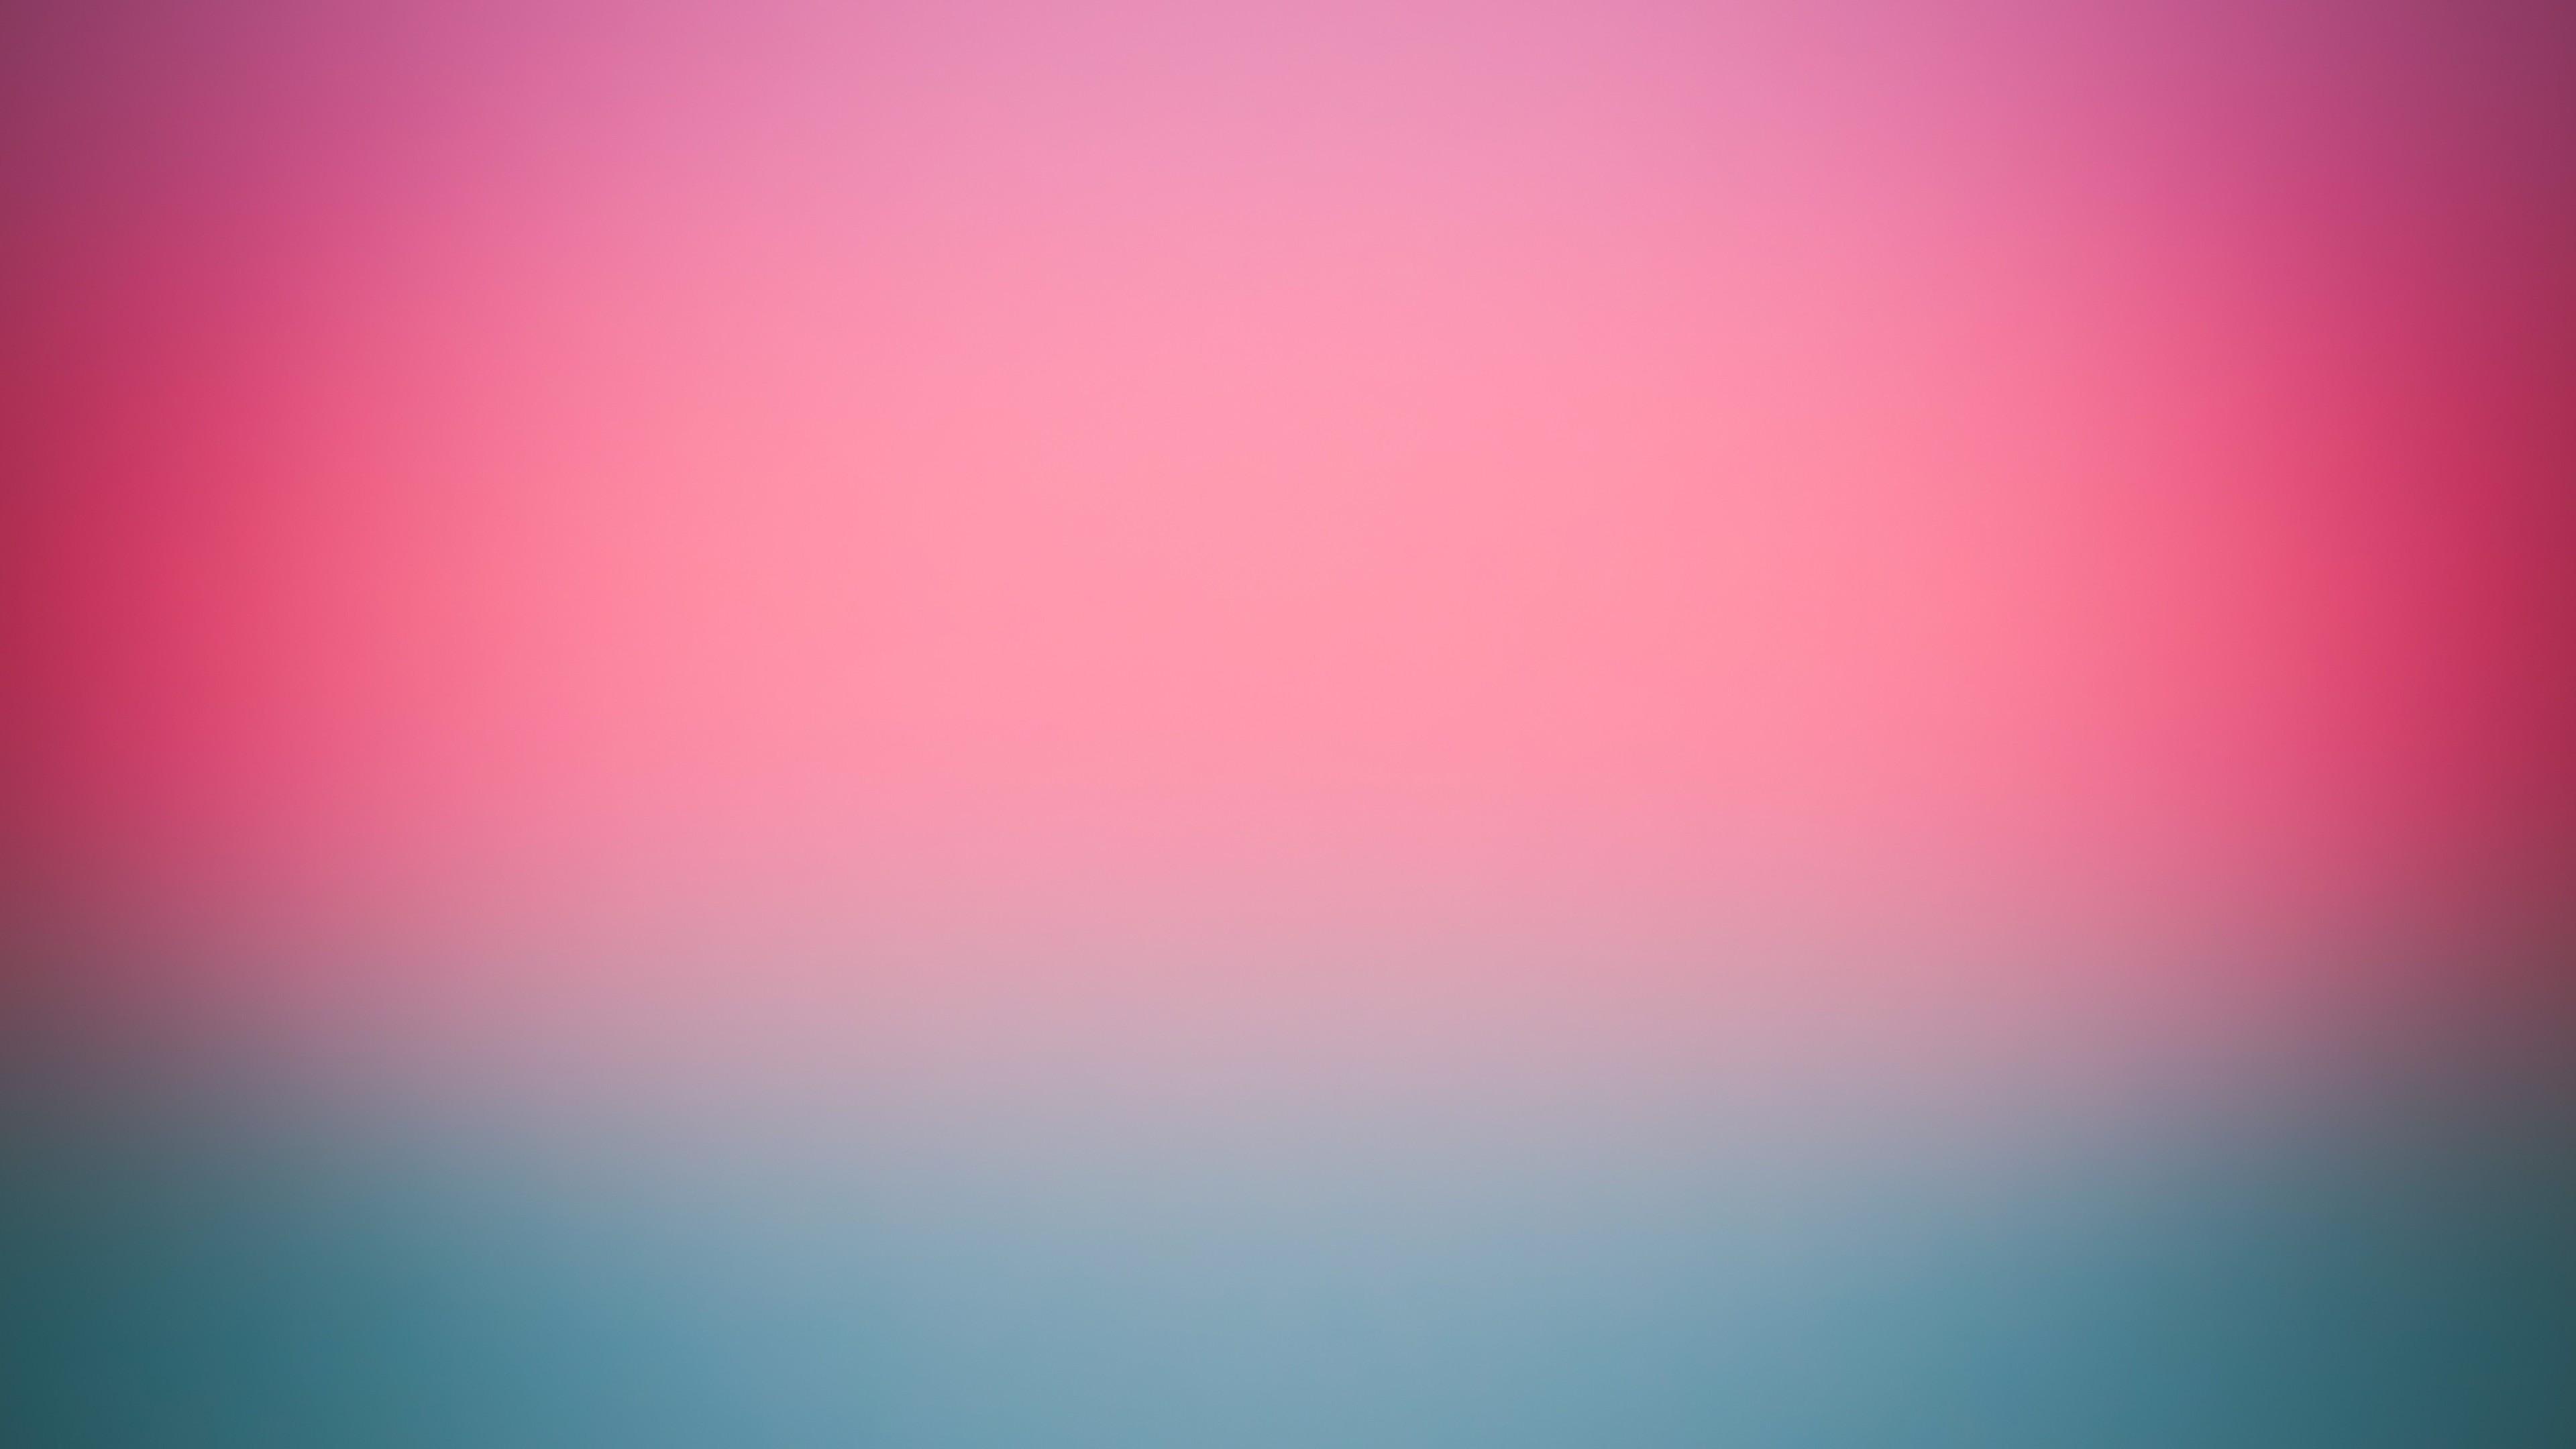 Розово-серый абстрактный фон